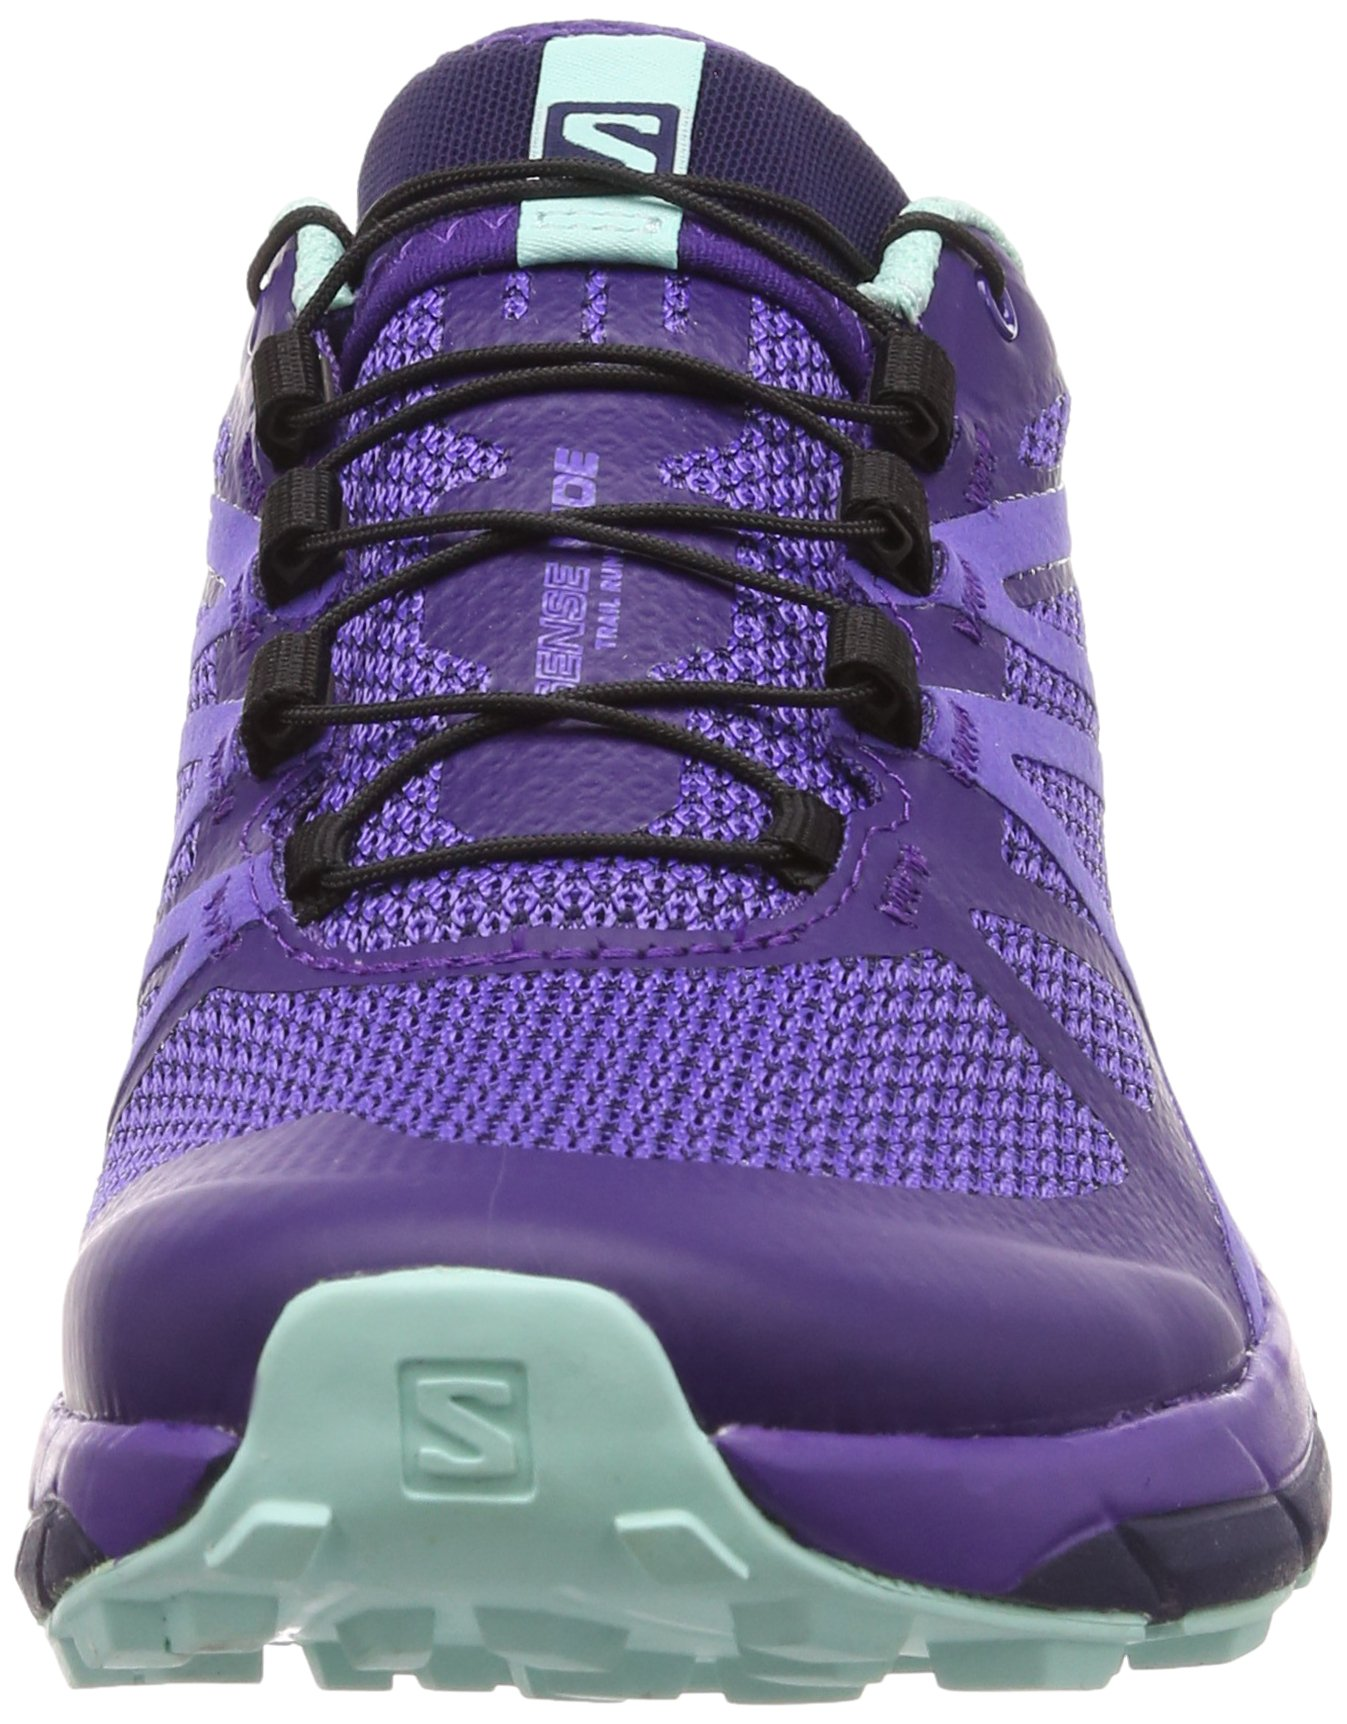 Salomon Women's Sense Ride Running Shoes, Purple, 6.5 M by Salomon (Image #4)